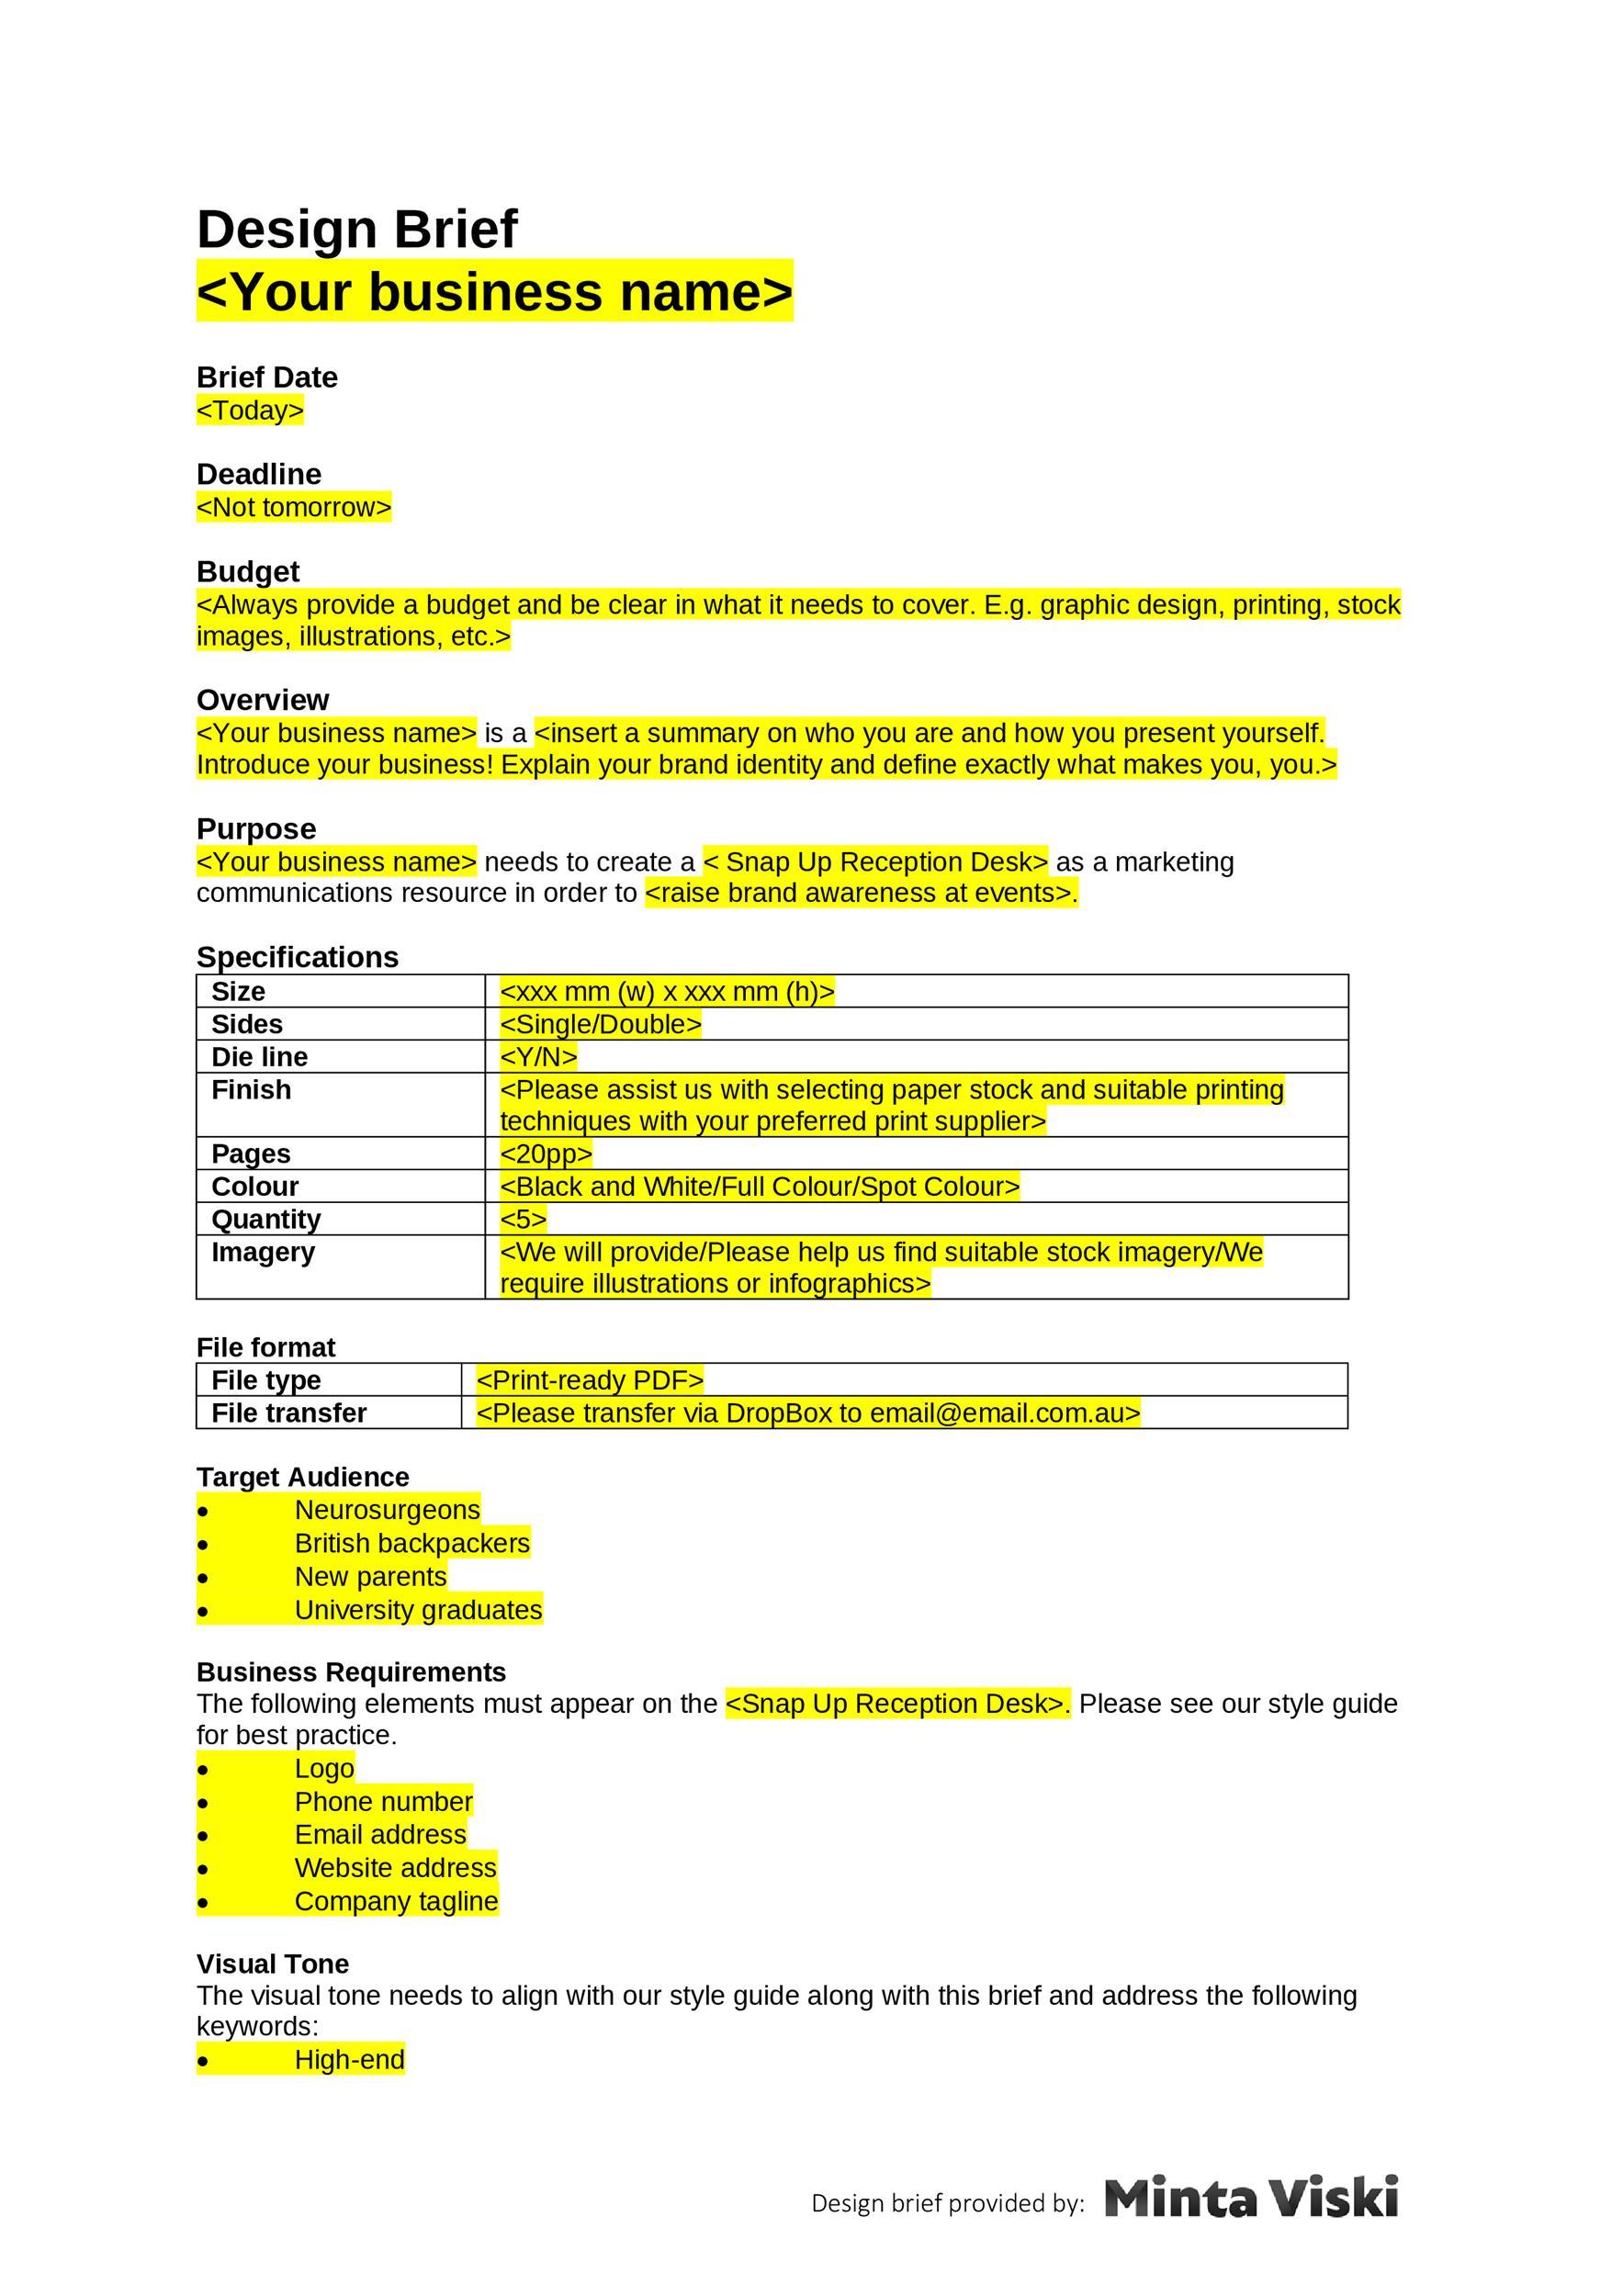 Free design brief template 36